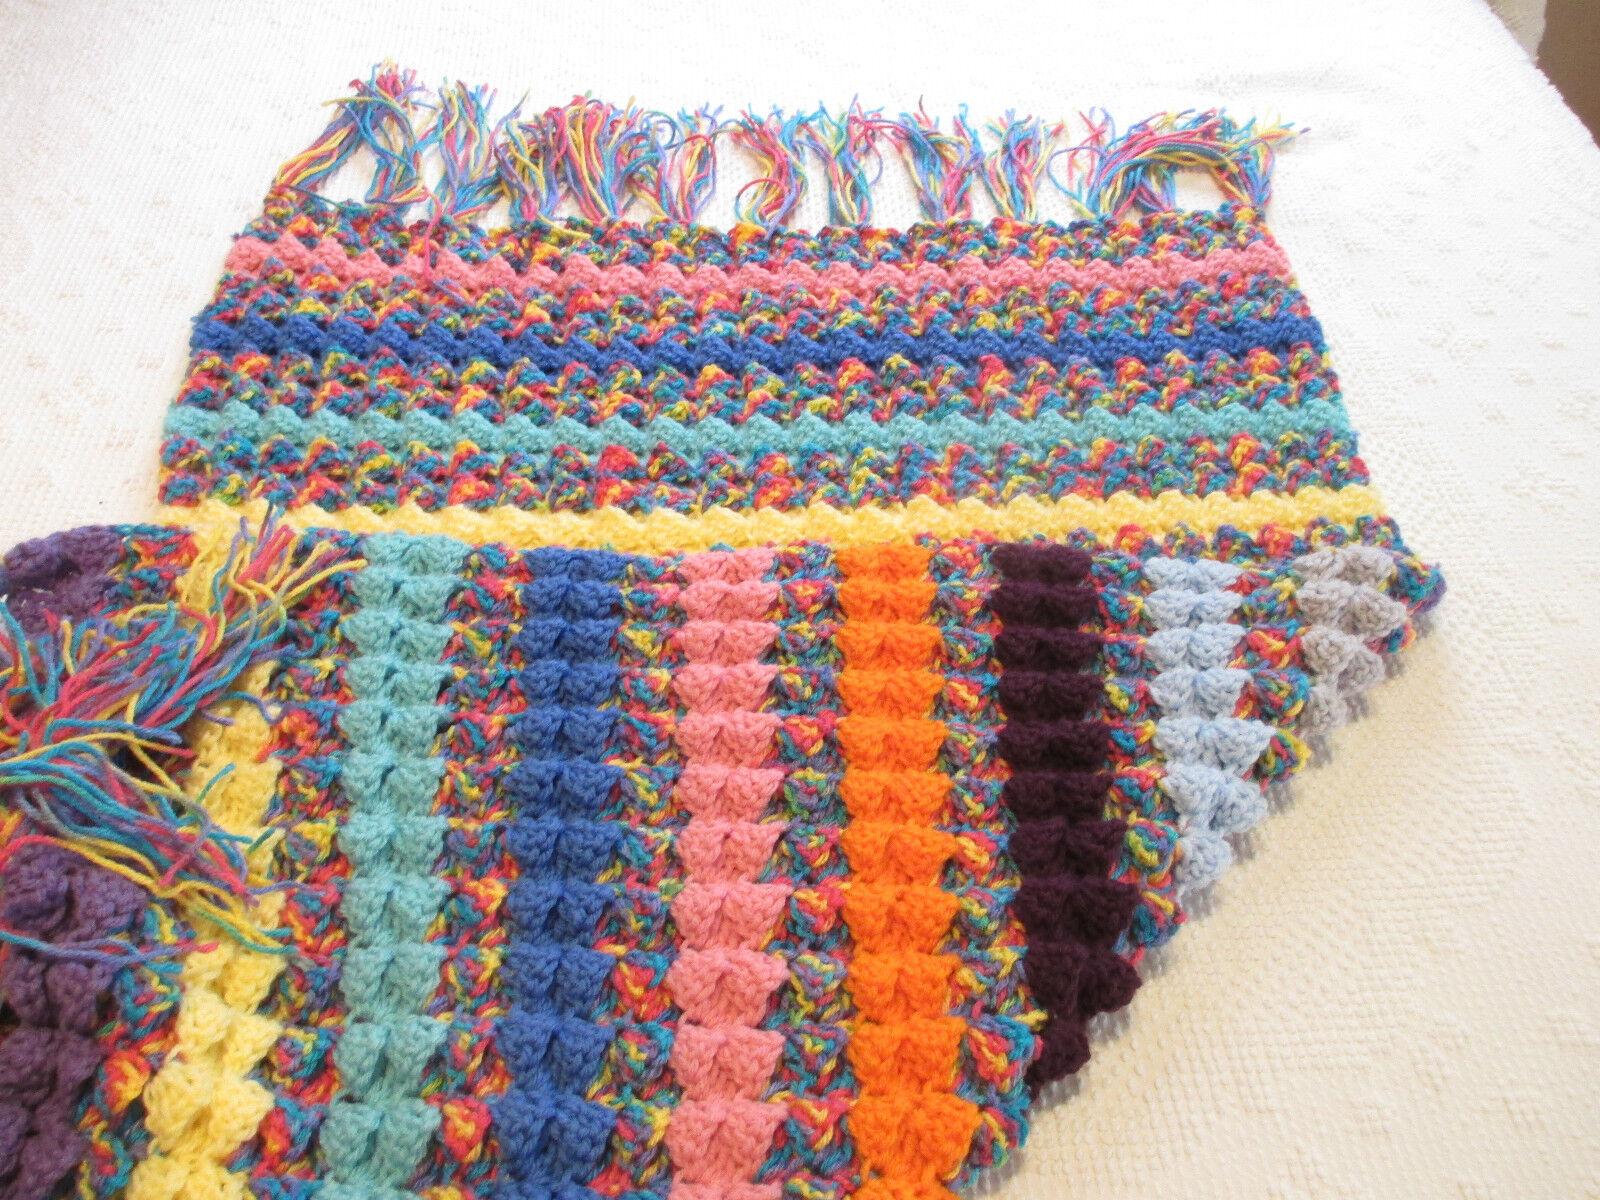 Handmade YOUTH Shells Pattern Crochet Afghan Throw Blanket - New